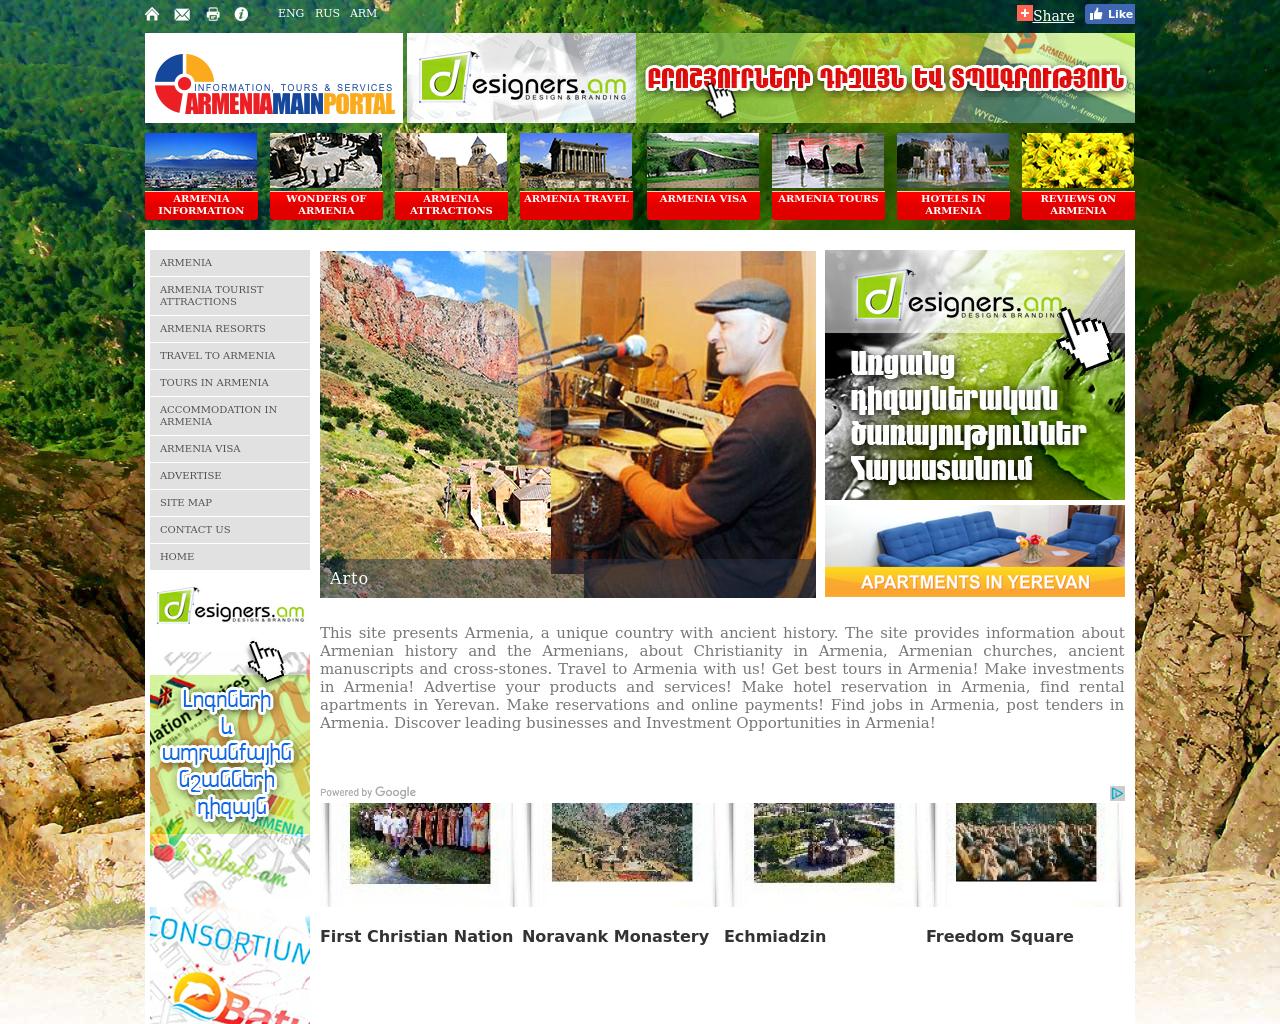 Armenia-Main-Portal-Advertising-Reviews-Pricing